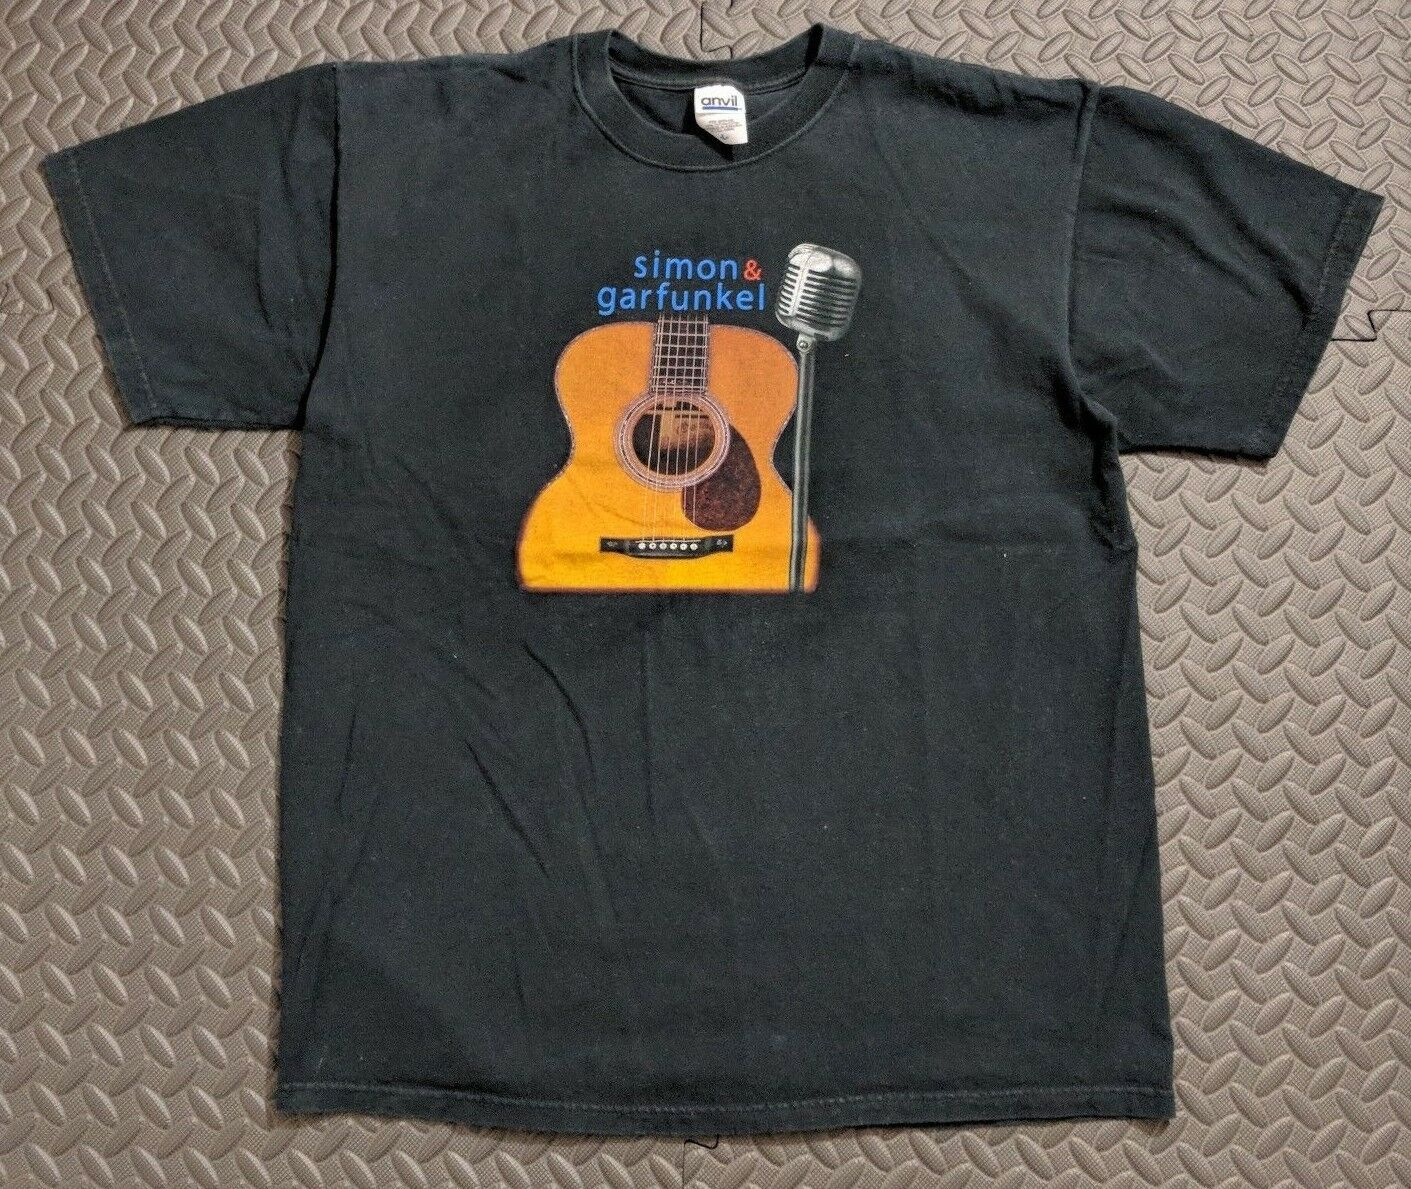 22ceb07e Vintage Simon and Garfunkel 2004 Concert Tour Men's Tee Shirt sz LARGE